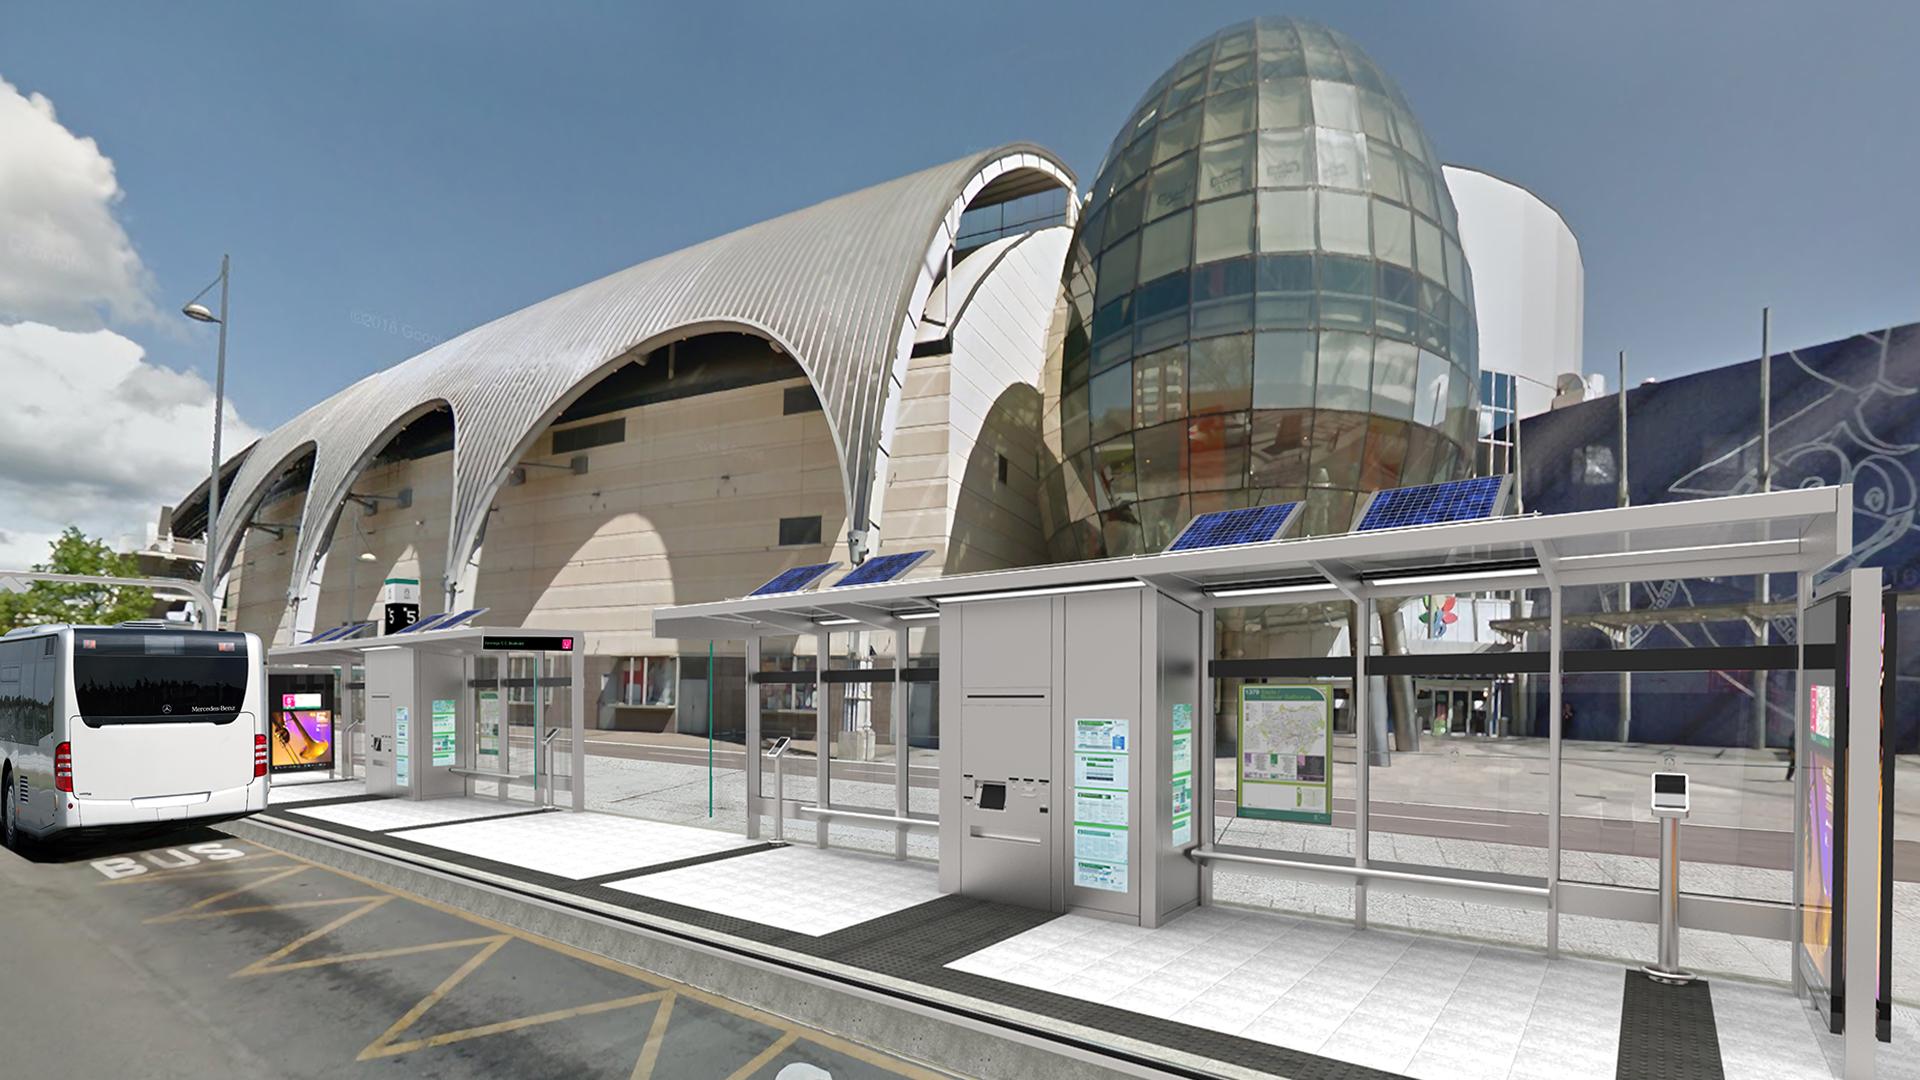 LKS KREAN, IRIZAR E-Mobility y YÁRRITU implantarán el Bus Eléctrico Inteligente de Vitoria-Gasteiz